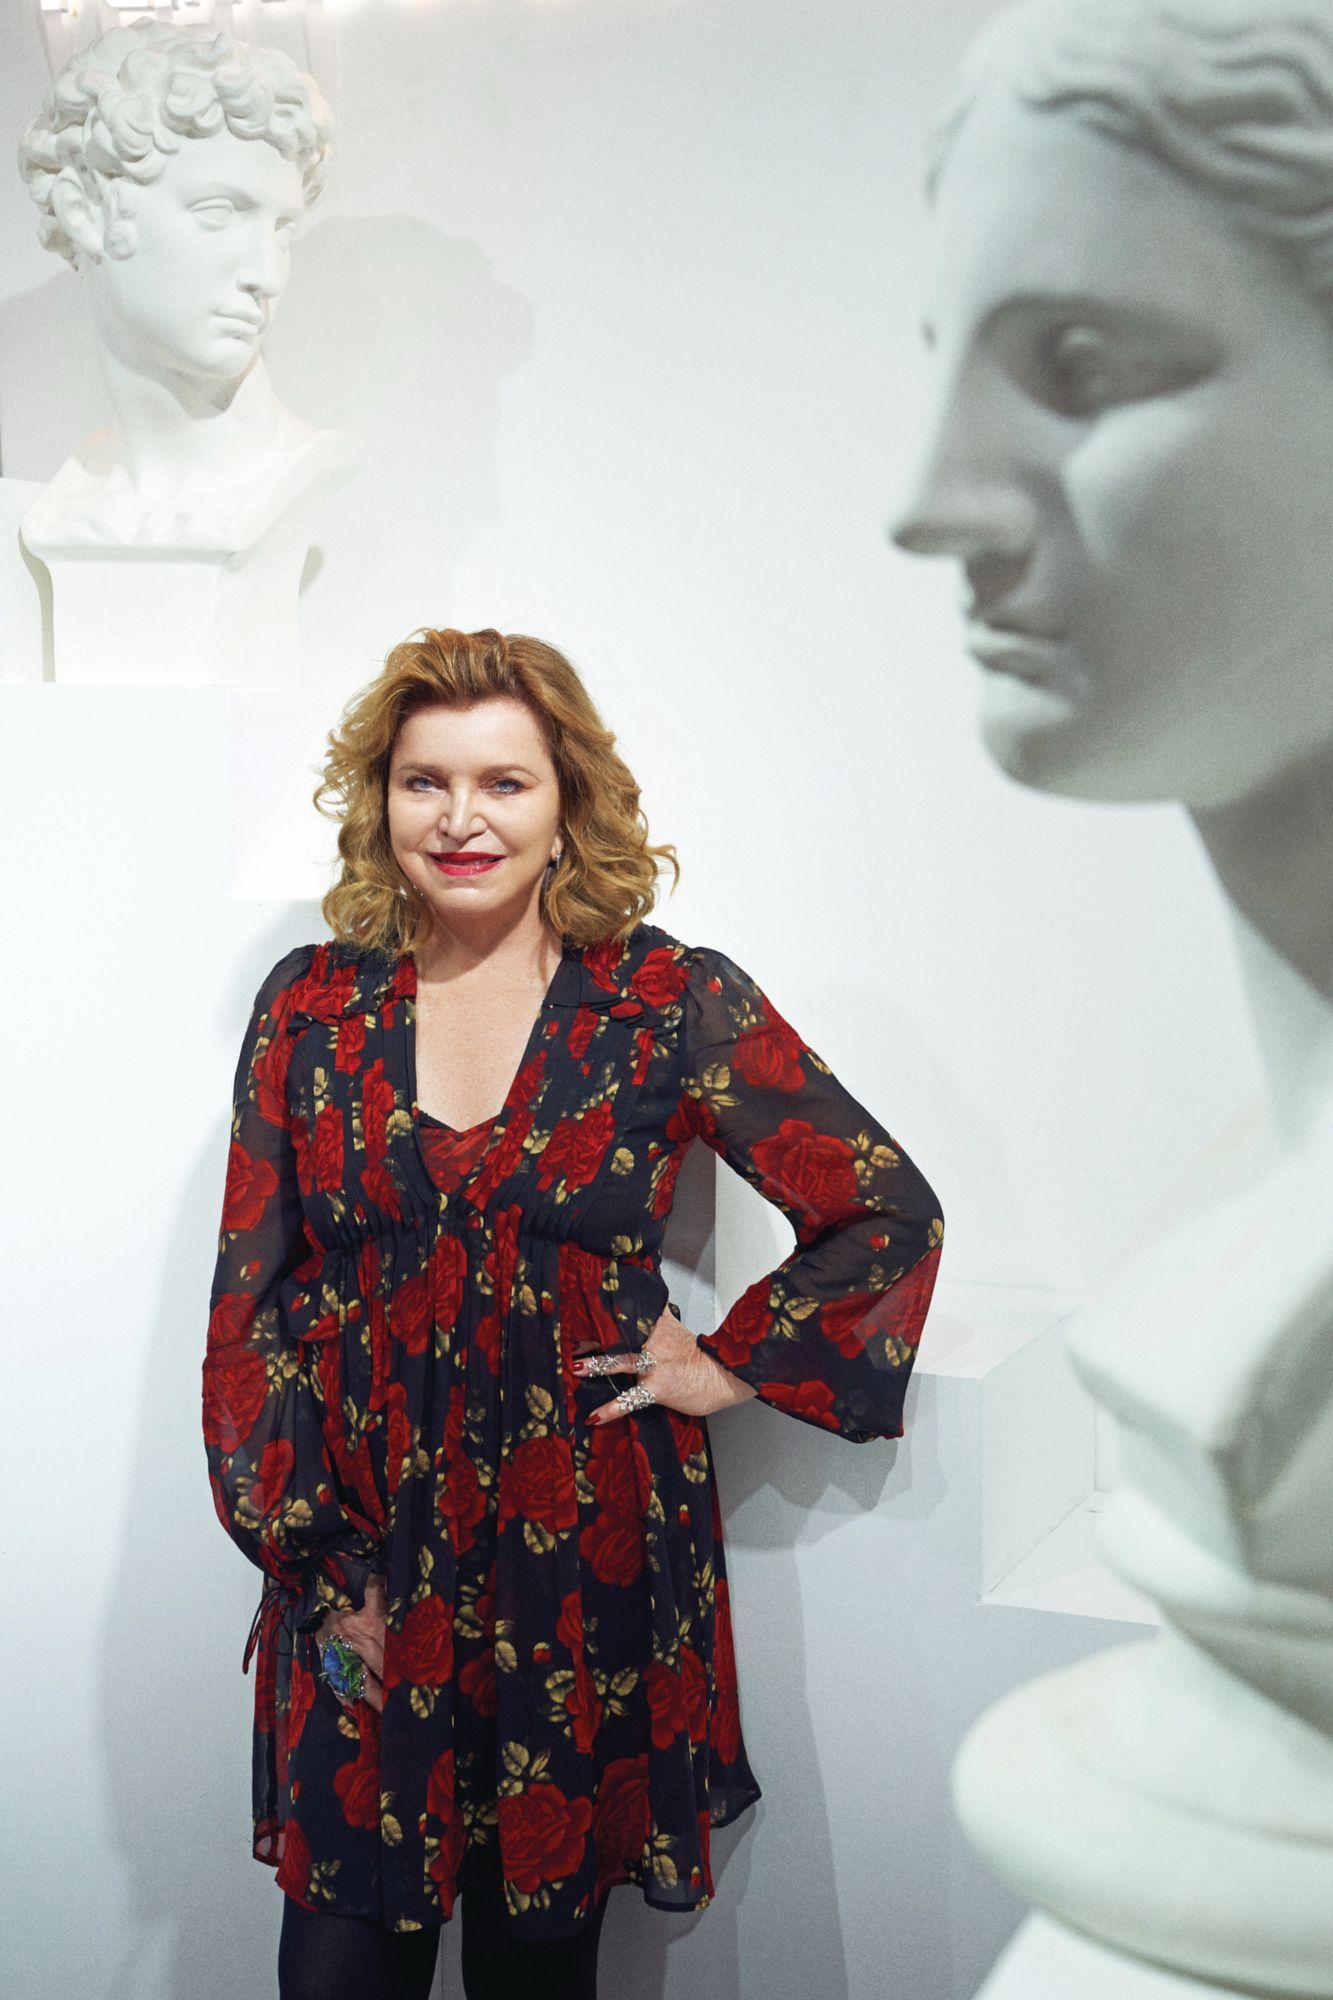 Gemmologist Lydia Courteille Gets Candid About Her Friendship With Karl Lagerfeld